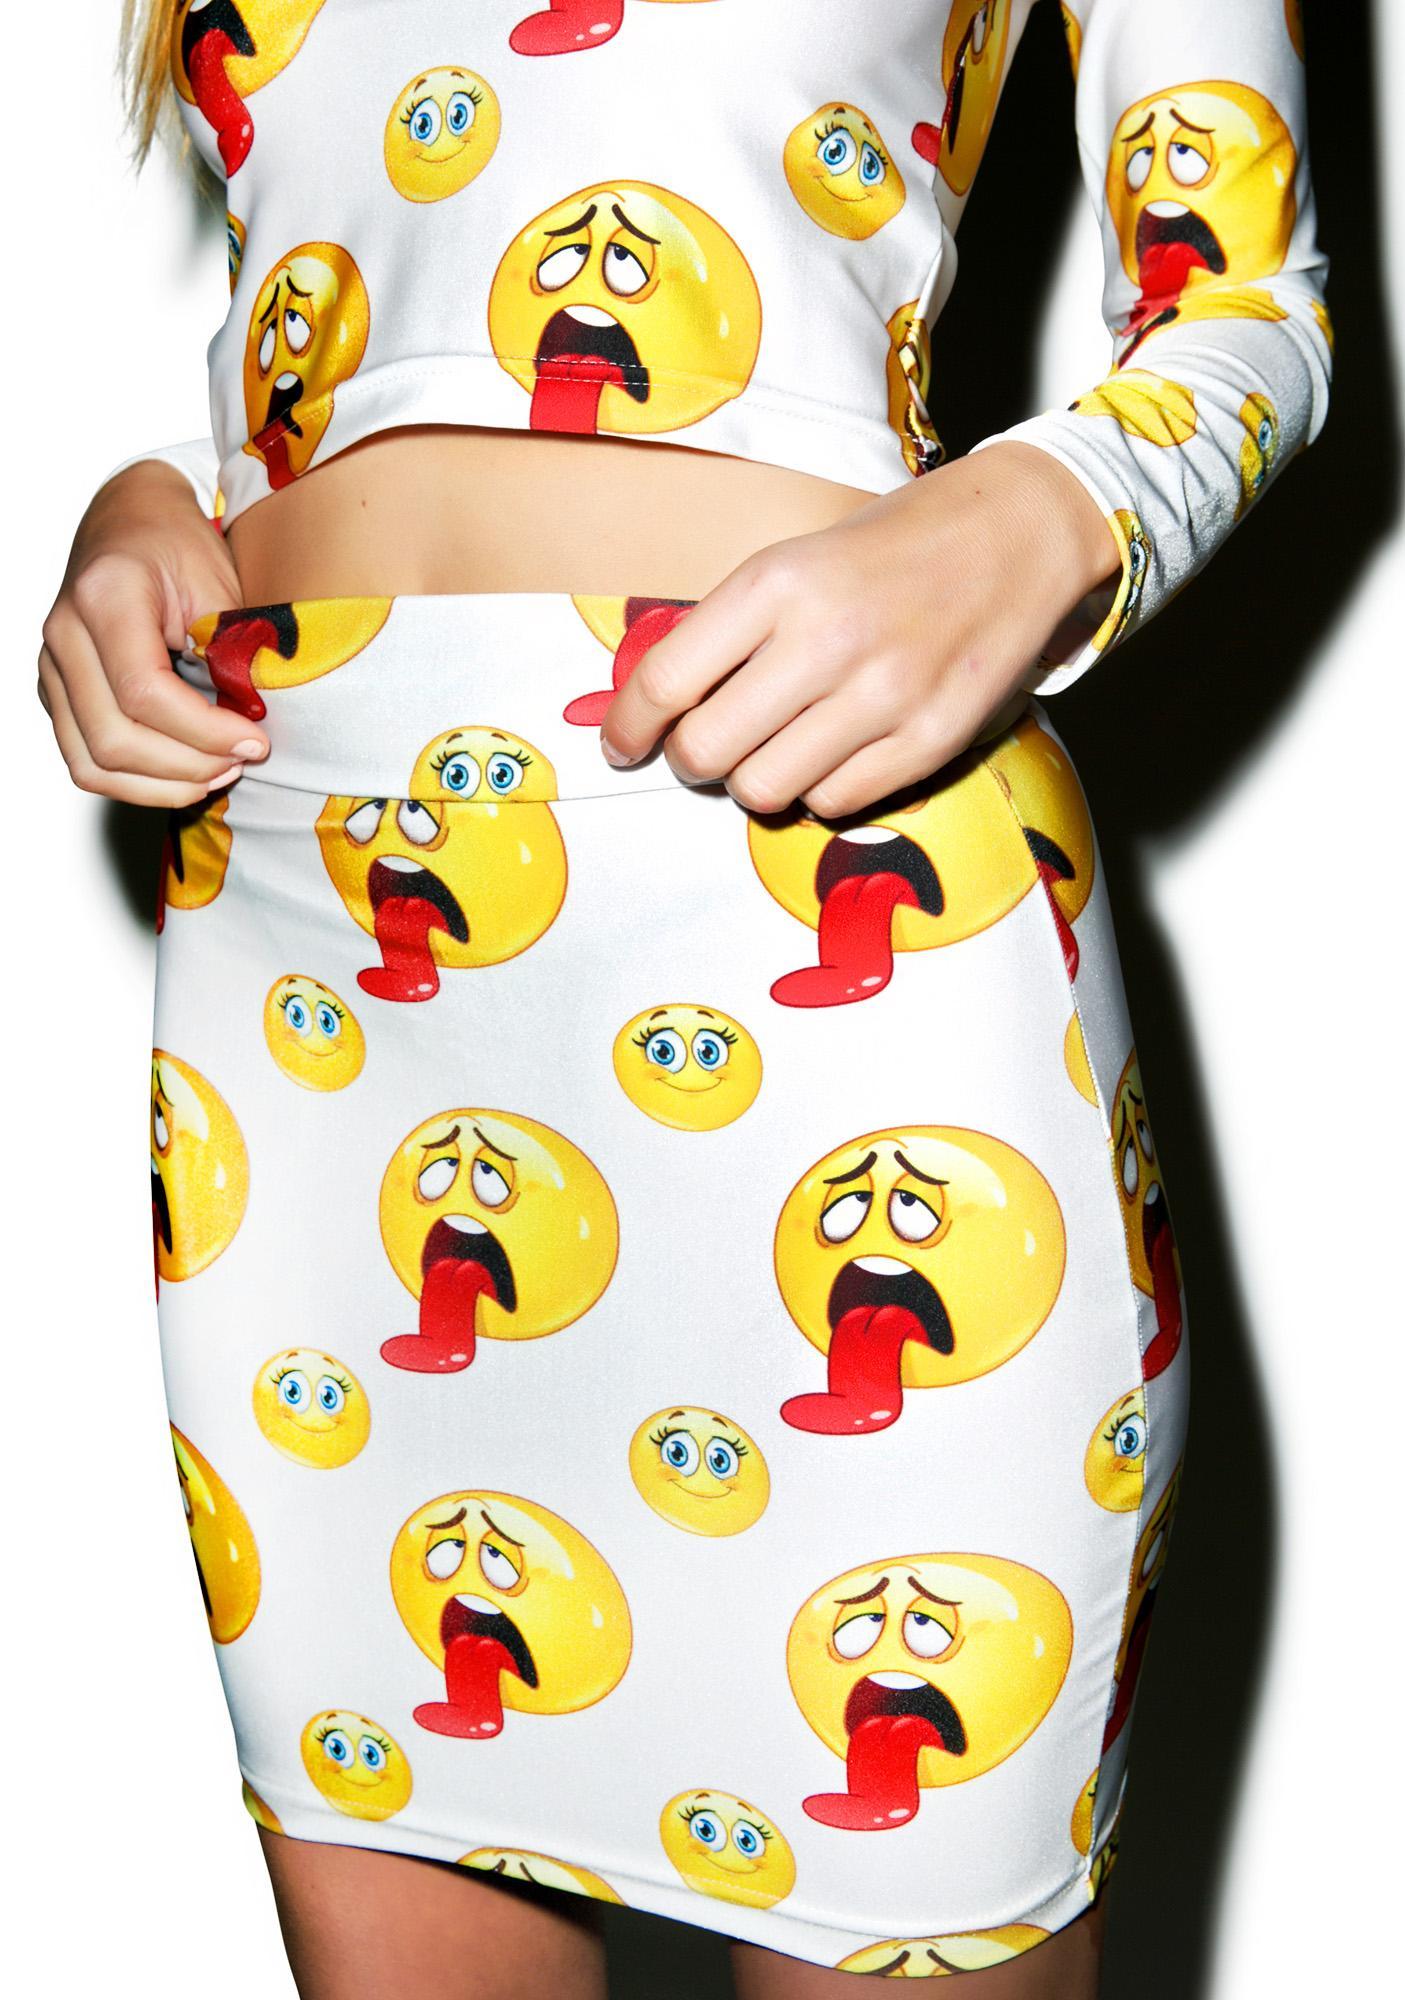 DEVOWEVO Sick Face Bandage Skirt